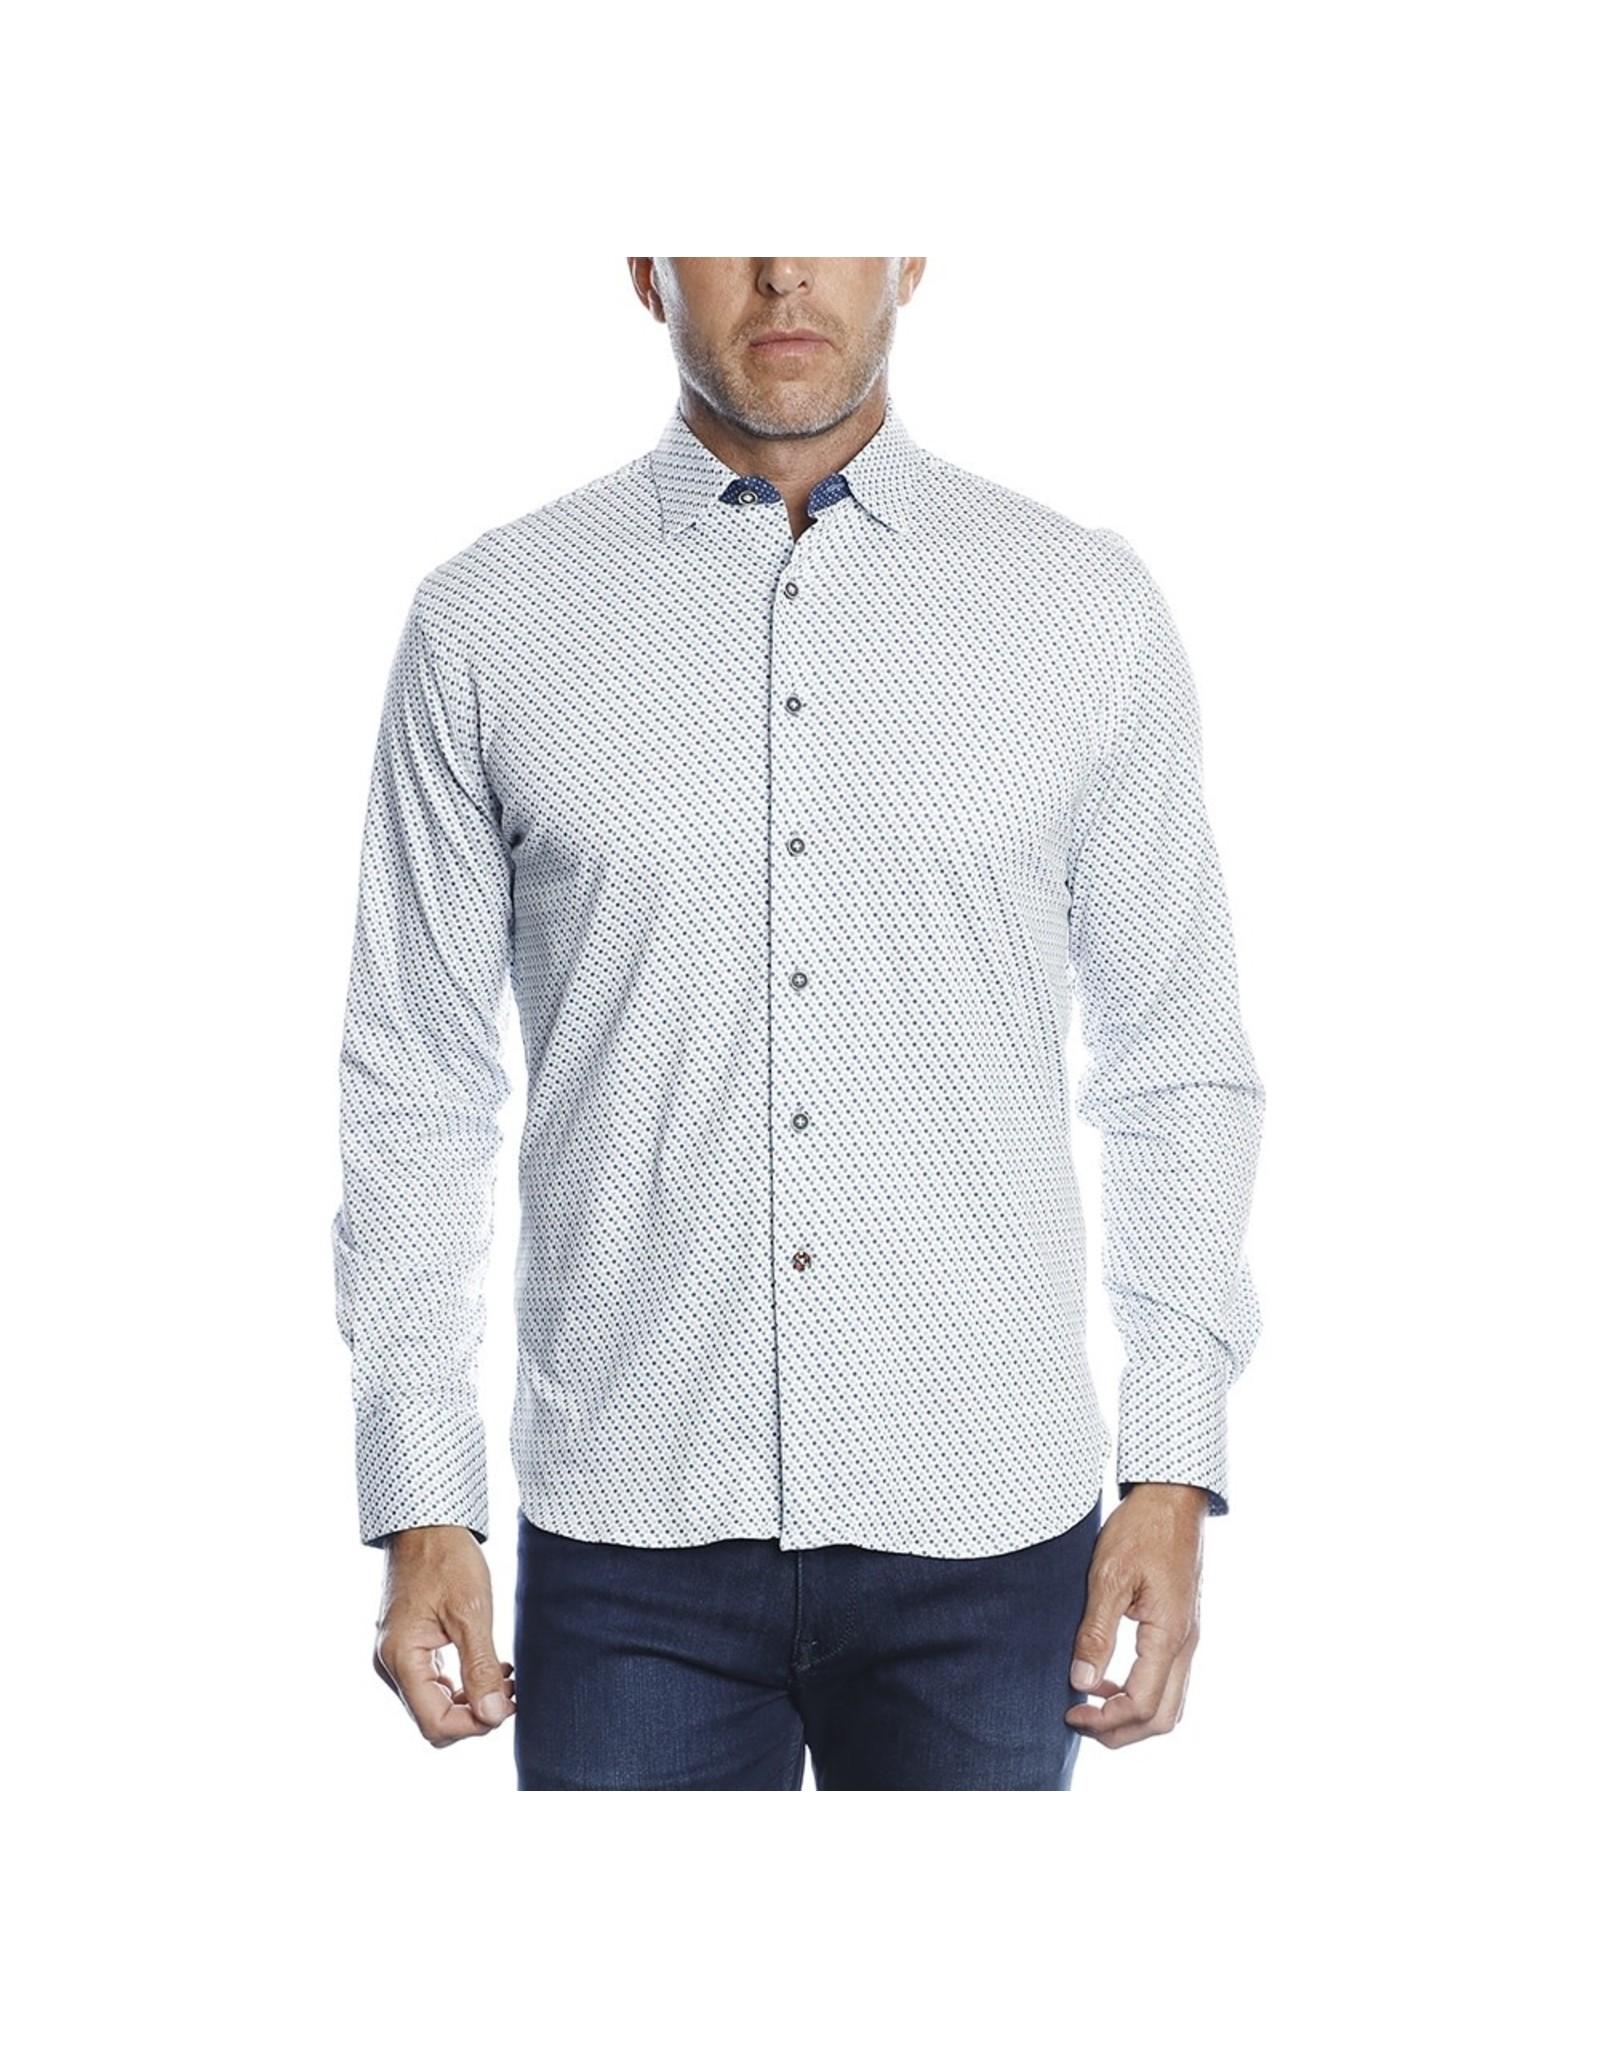 Luchiano Visconti 4331 Global Mint Shirt